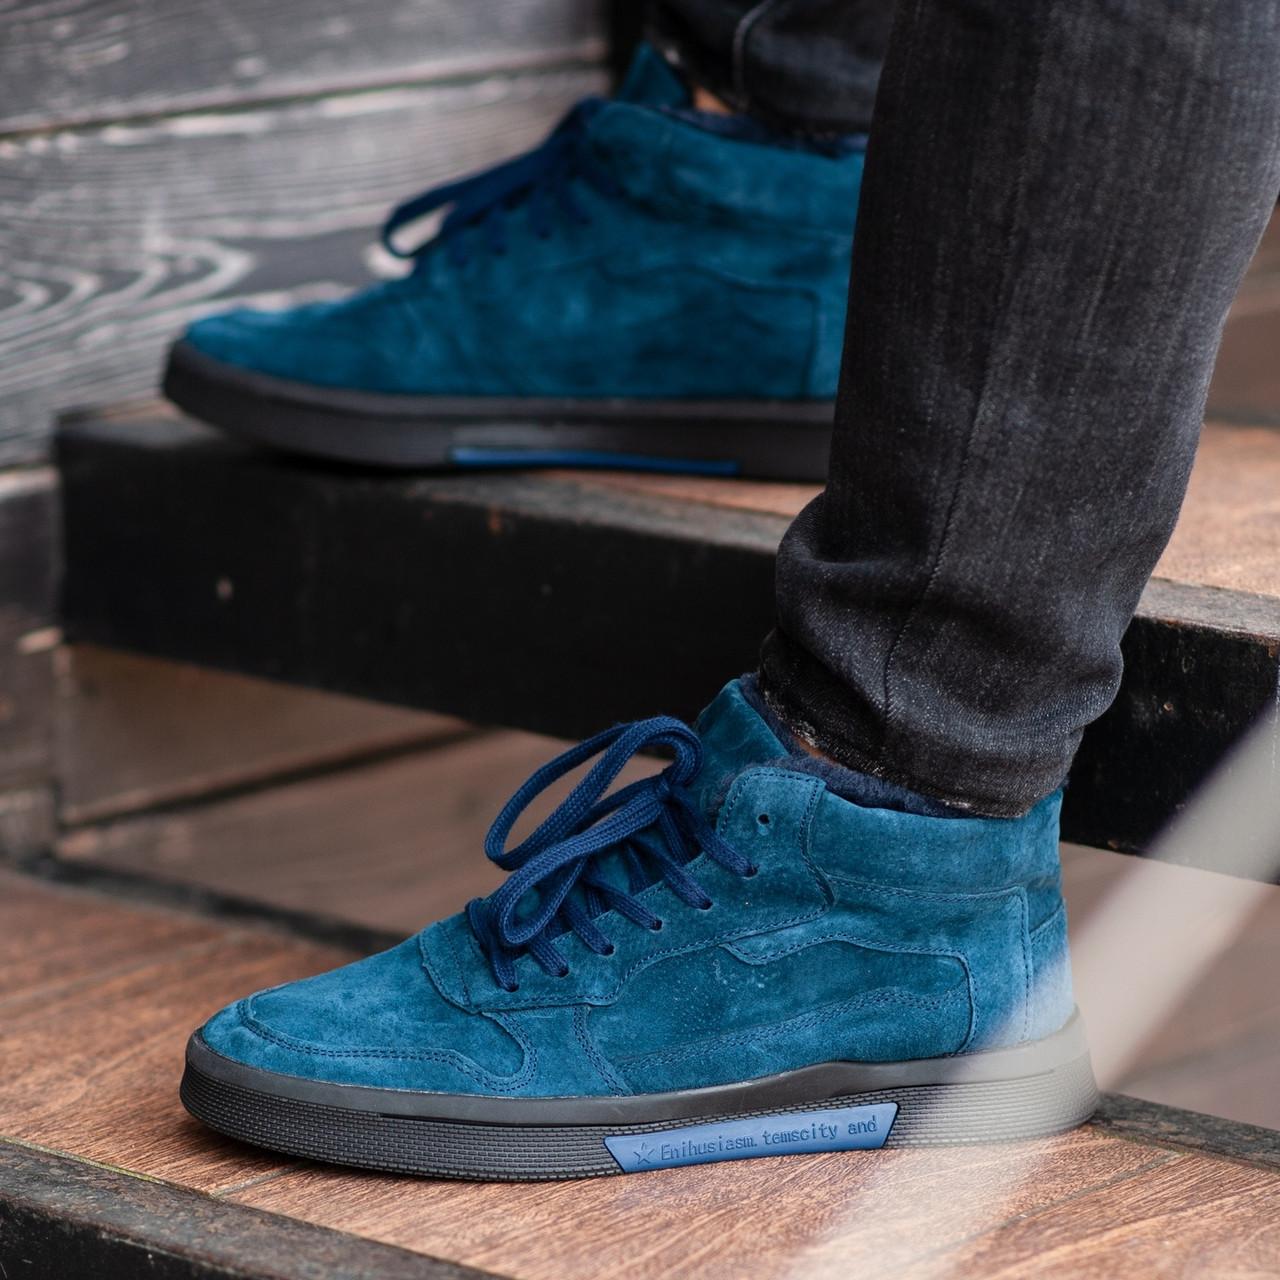 Ботинки мужские зимние South Oriole blue, зимние классические ботинки